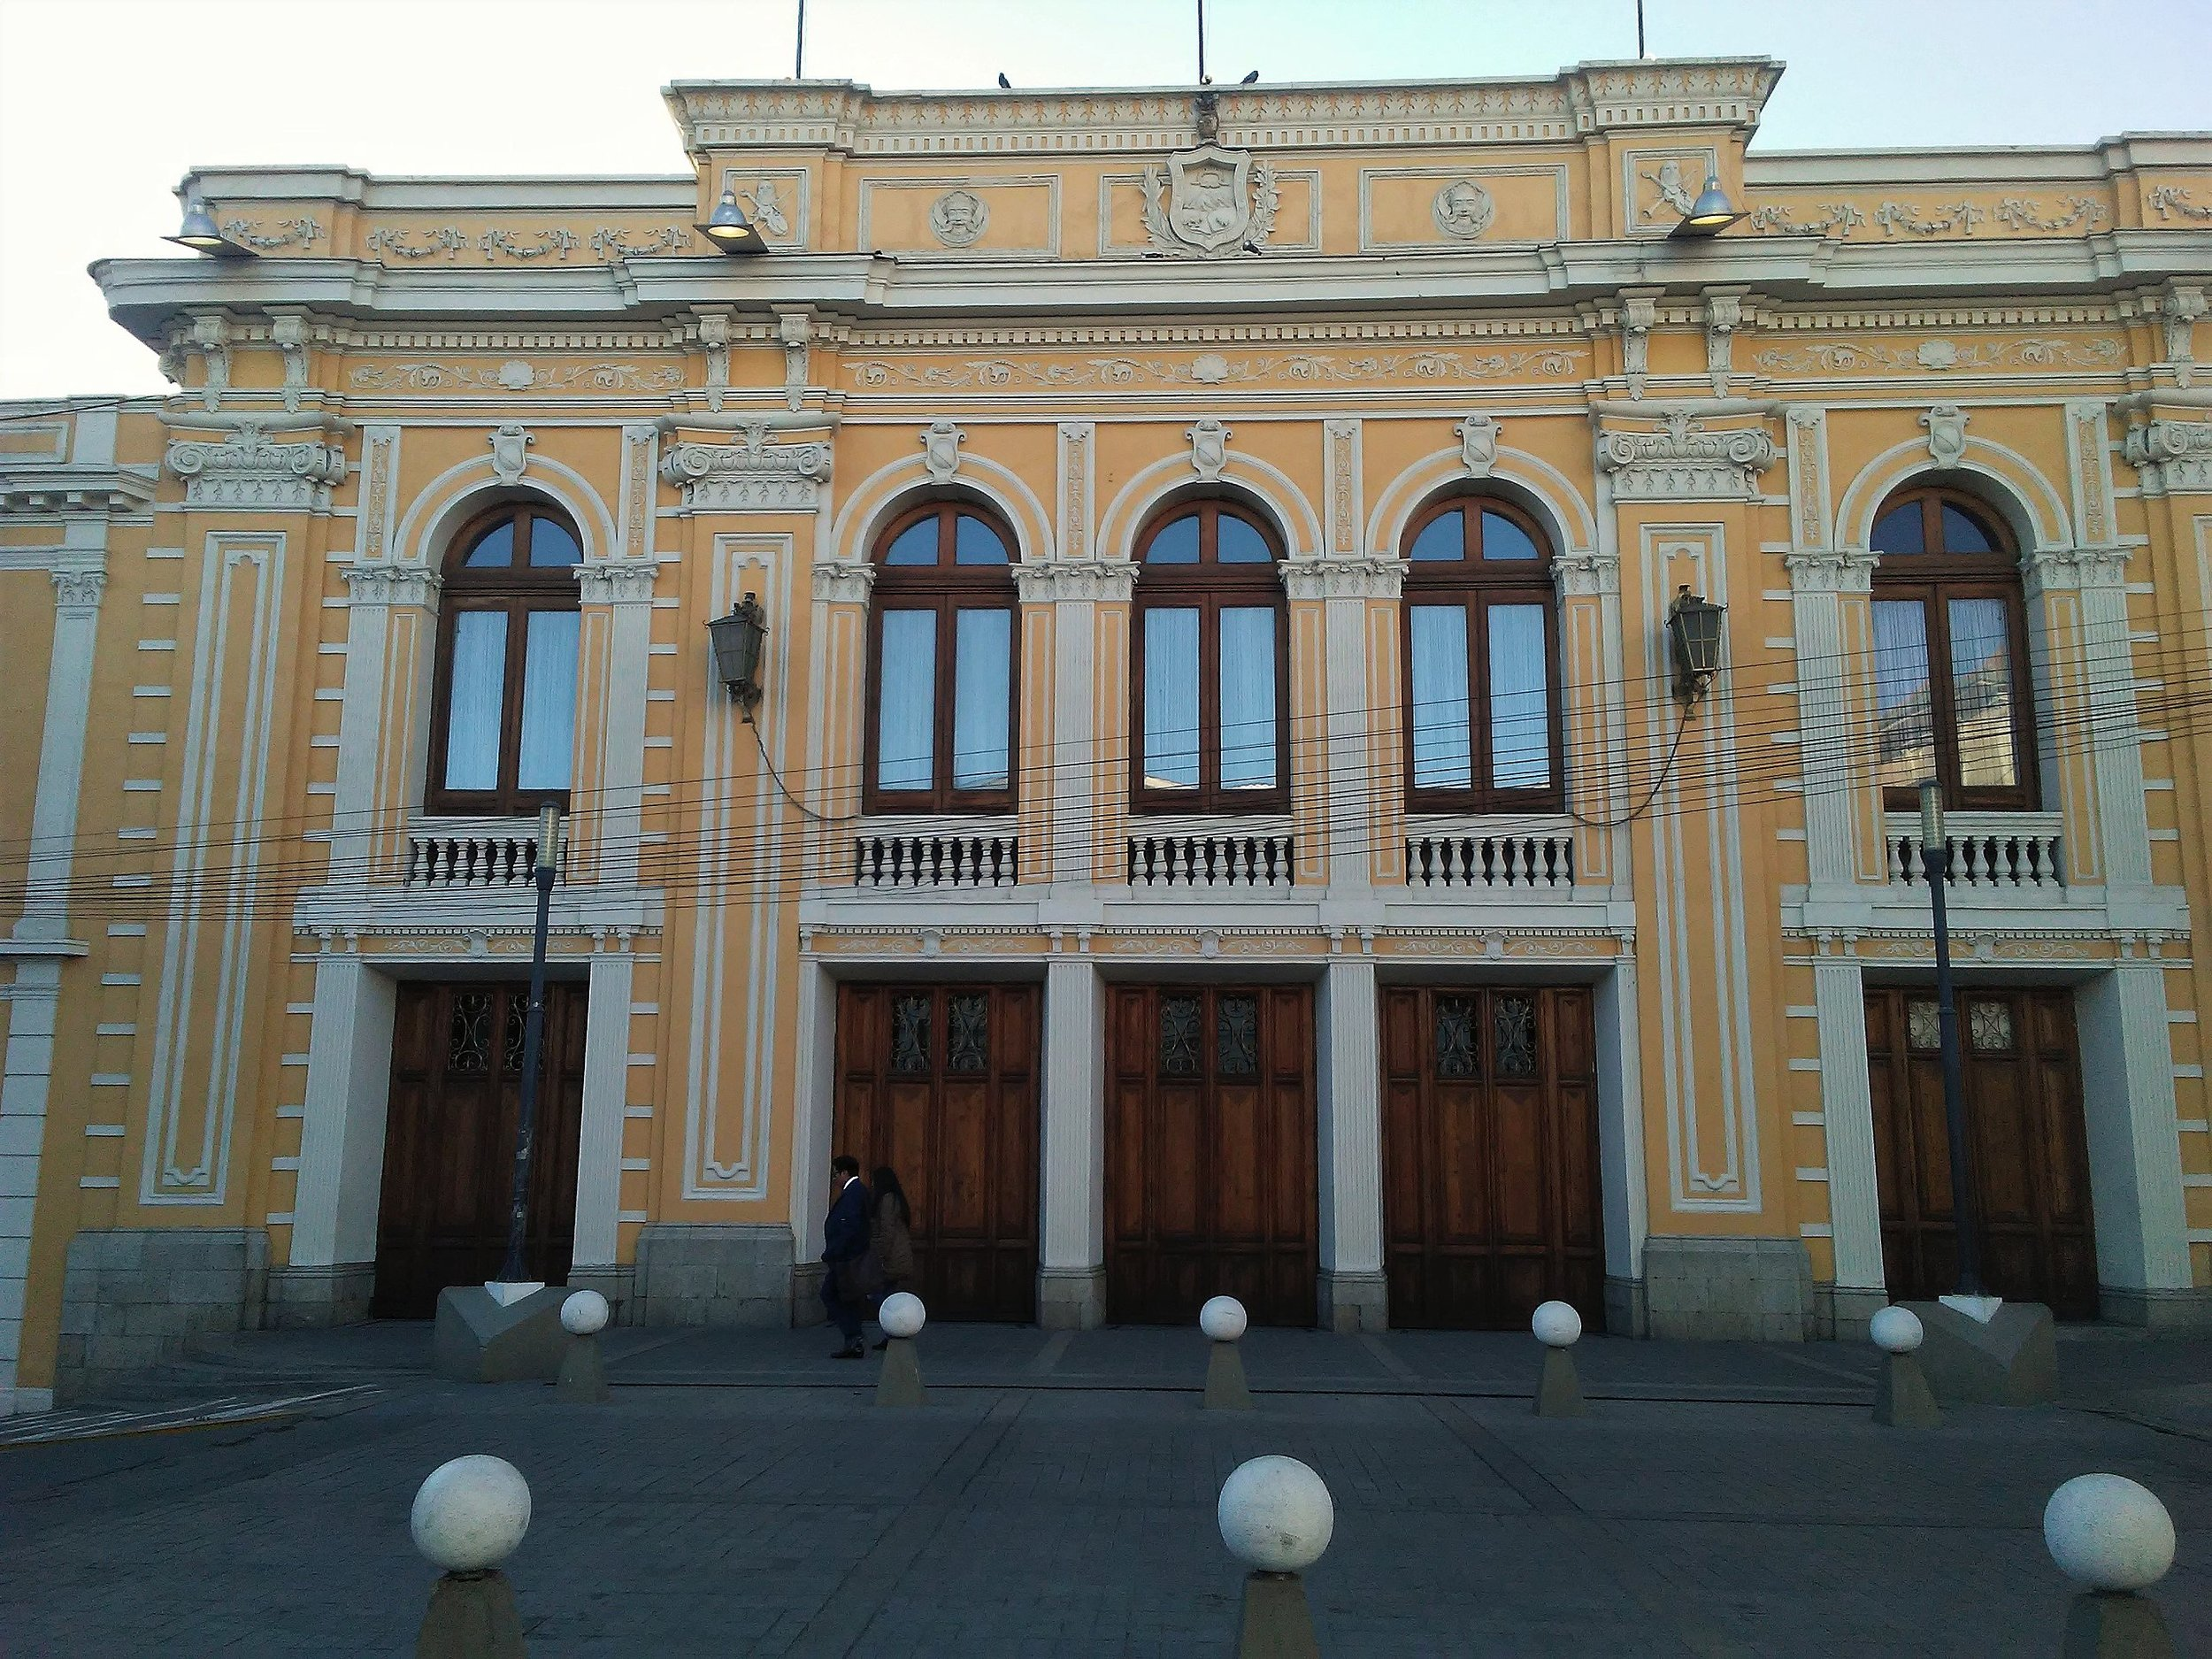 Teatro_Municipal_Alberto_Saavedra_Pérez_frente.jpg